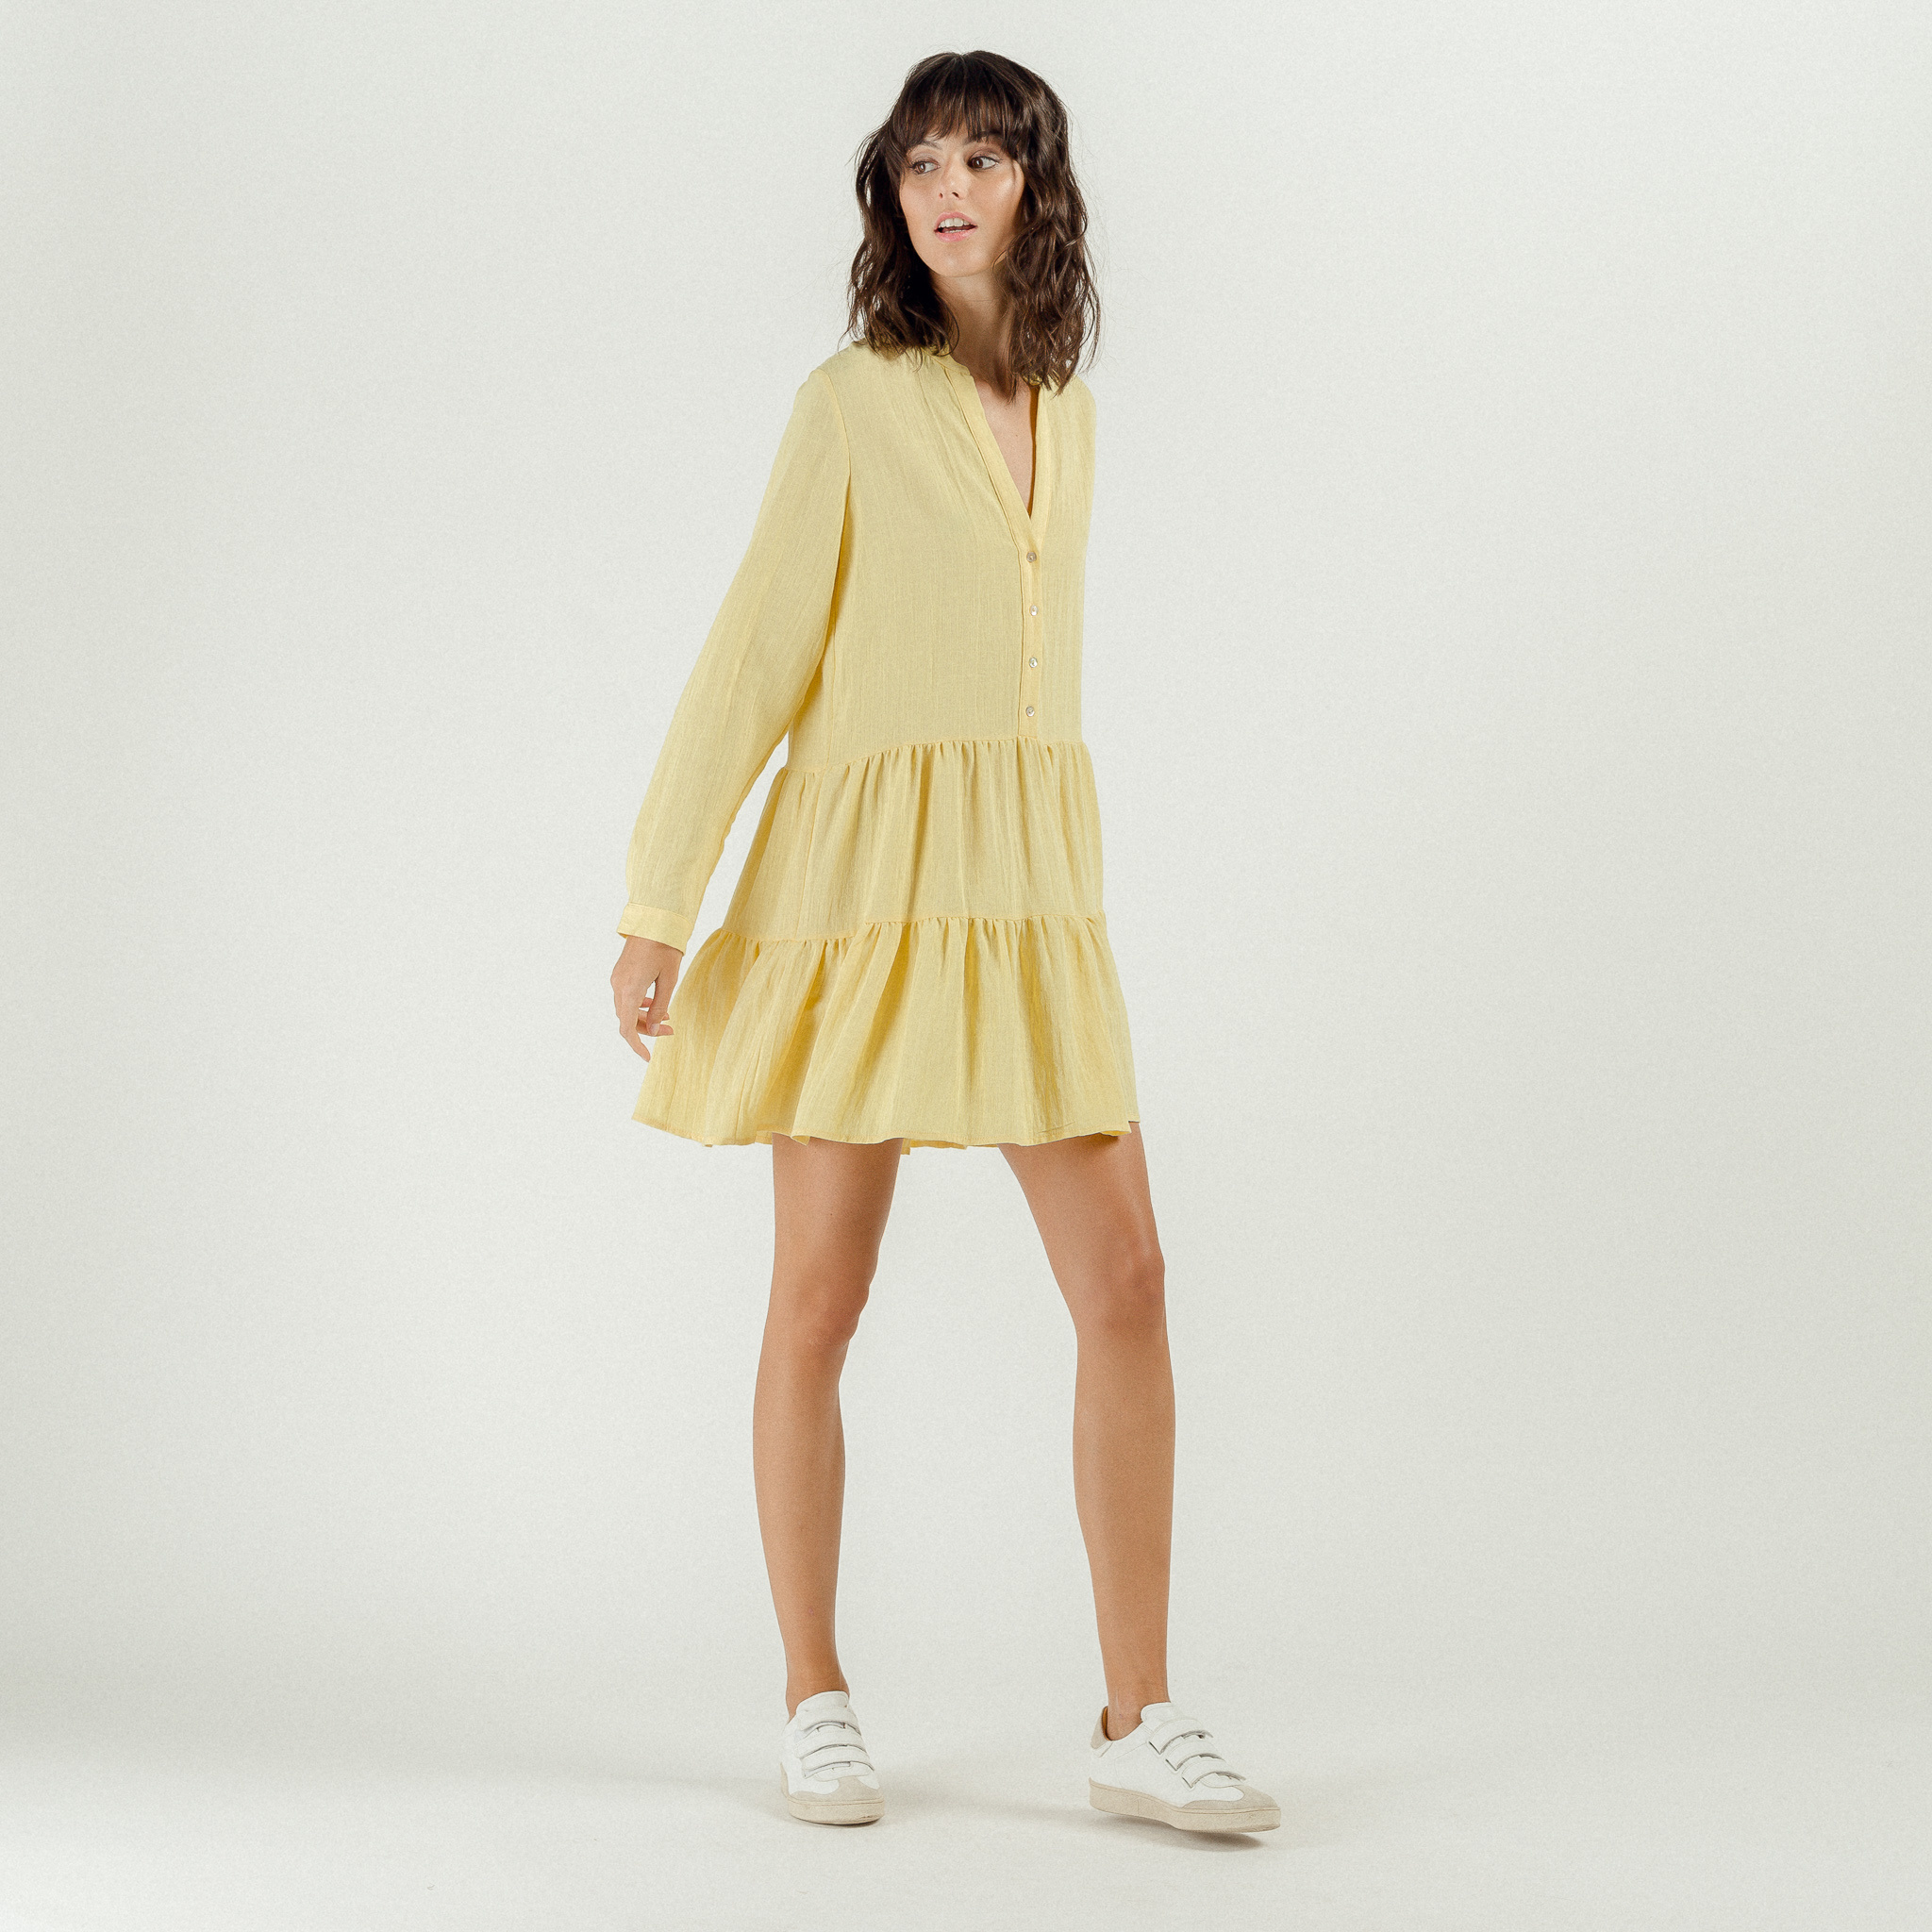 PEPITES robe yellow-7